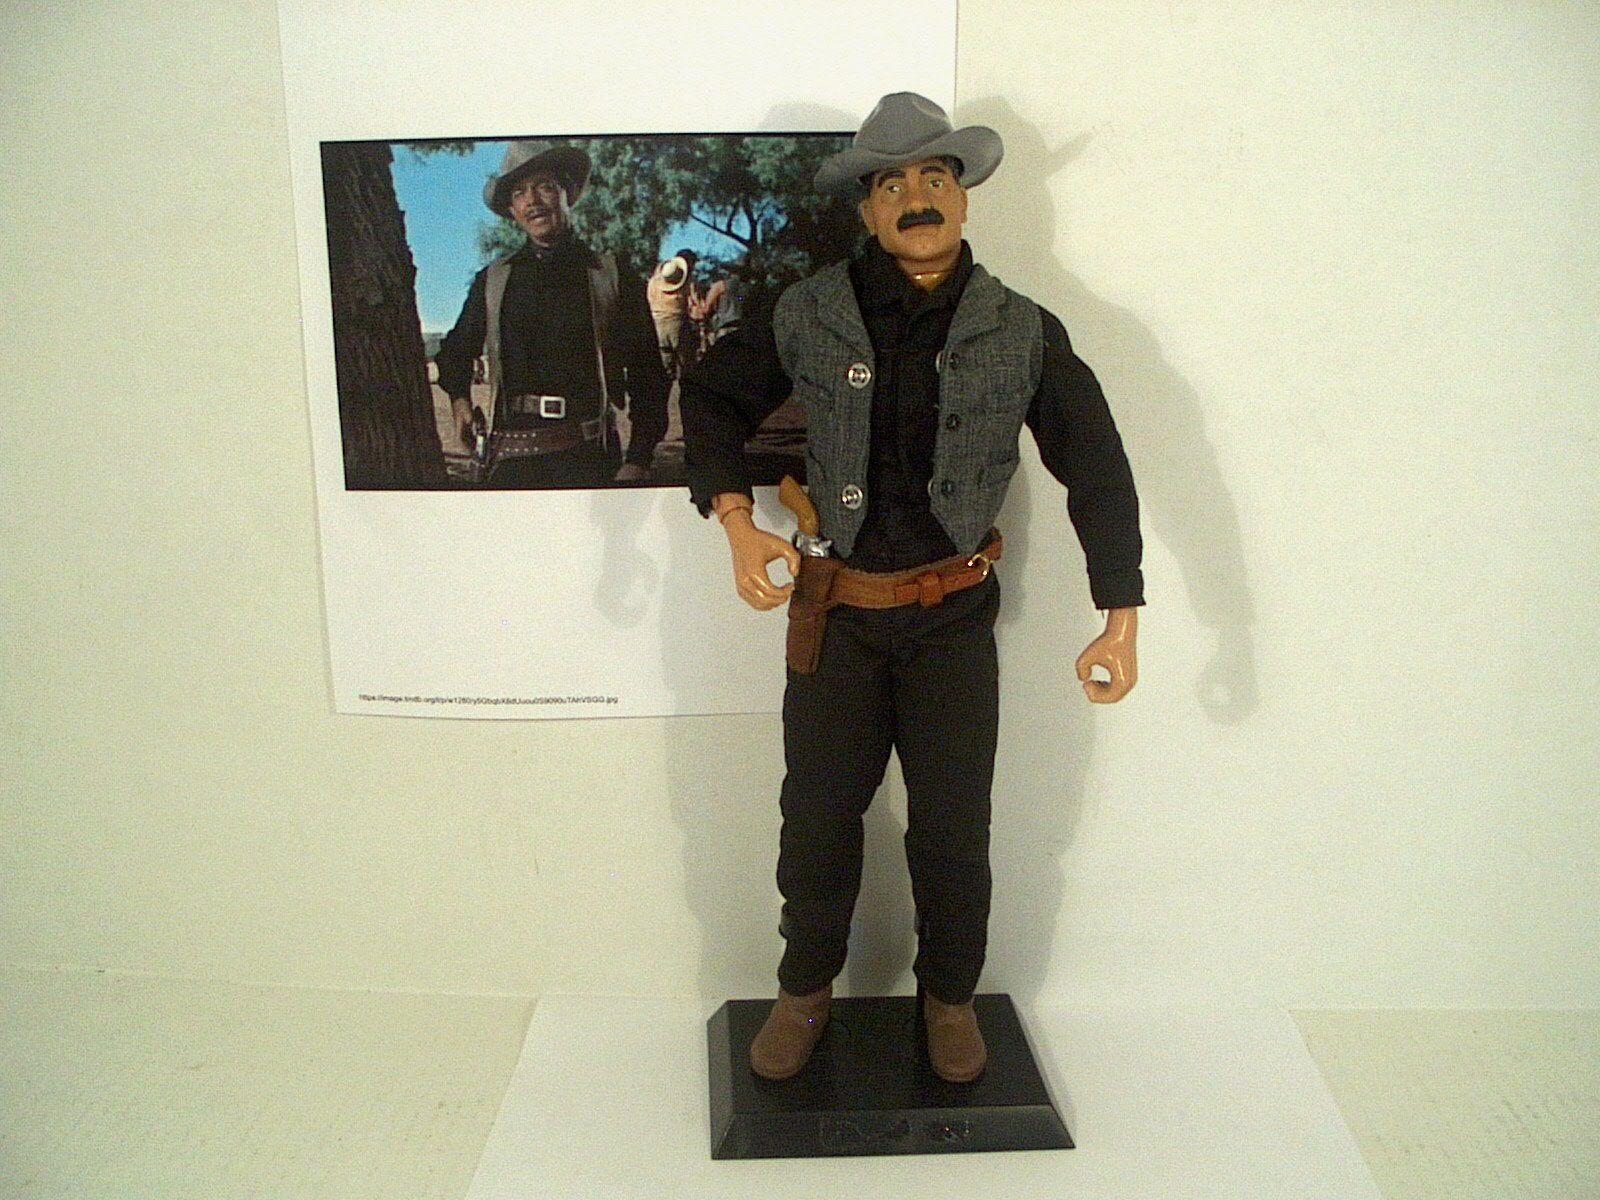 The Tall Men Clark Gable Ben Allison movie Old West 1 6 12  figure